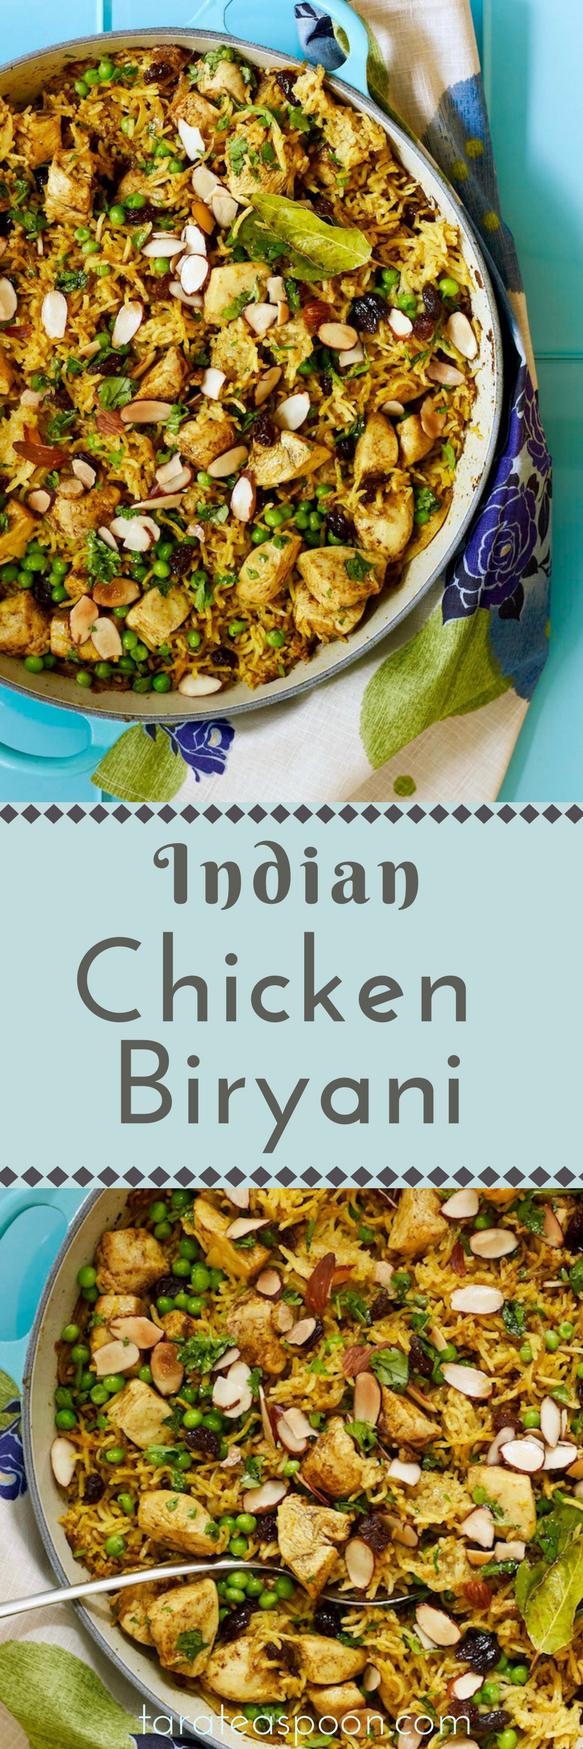 Chicken Biryani easy dinner casserole from Tara Teaspoon